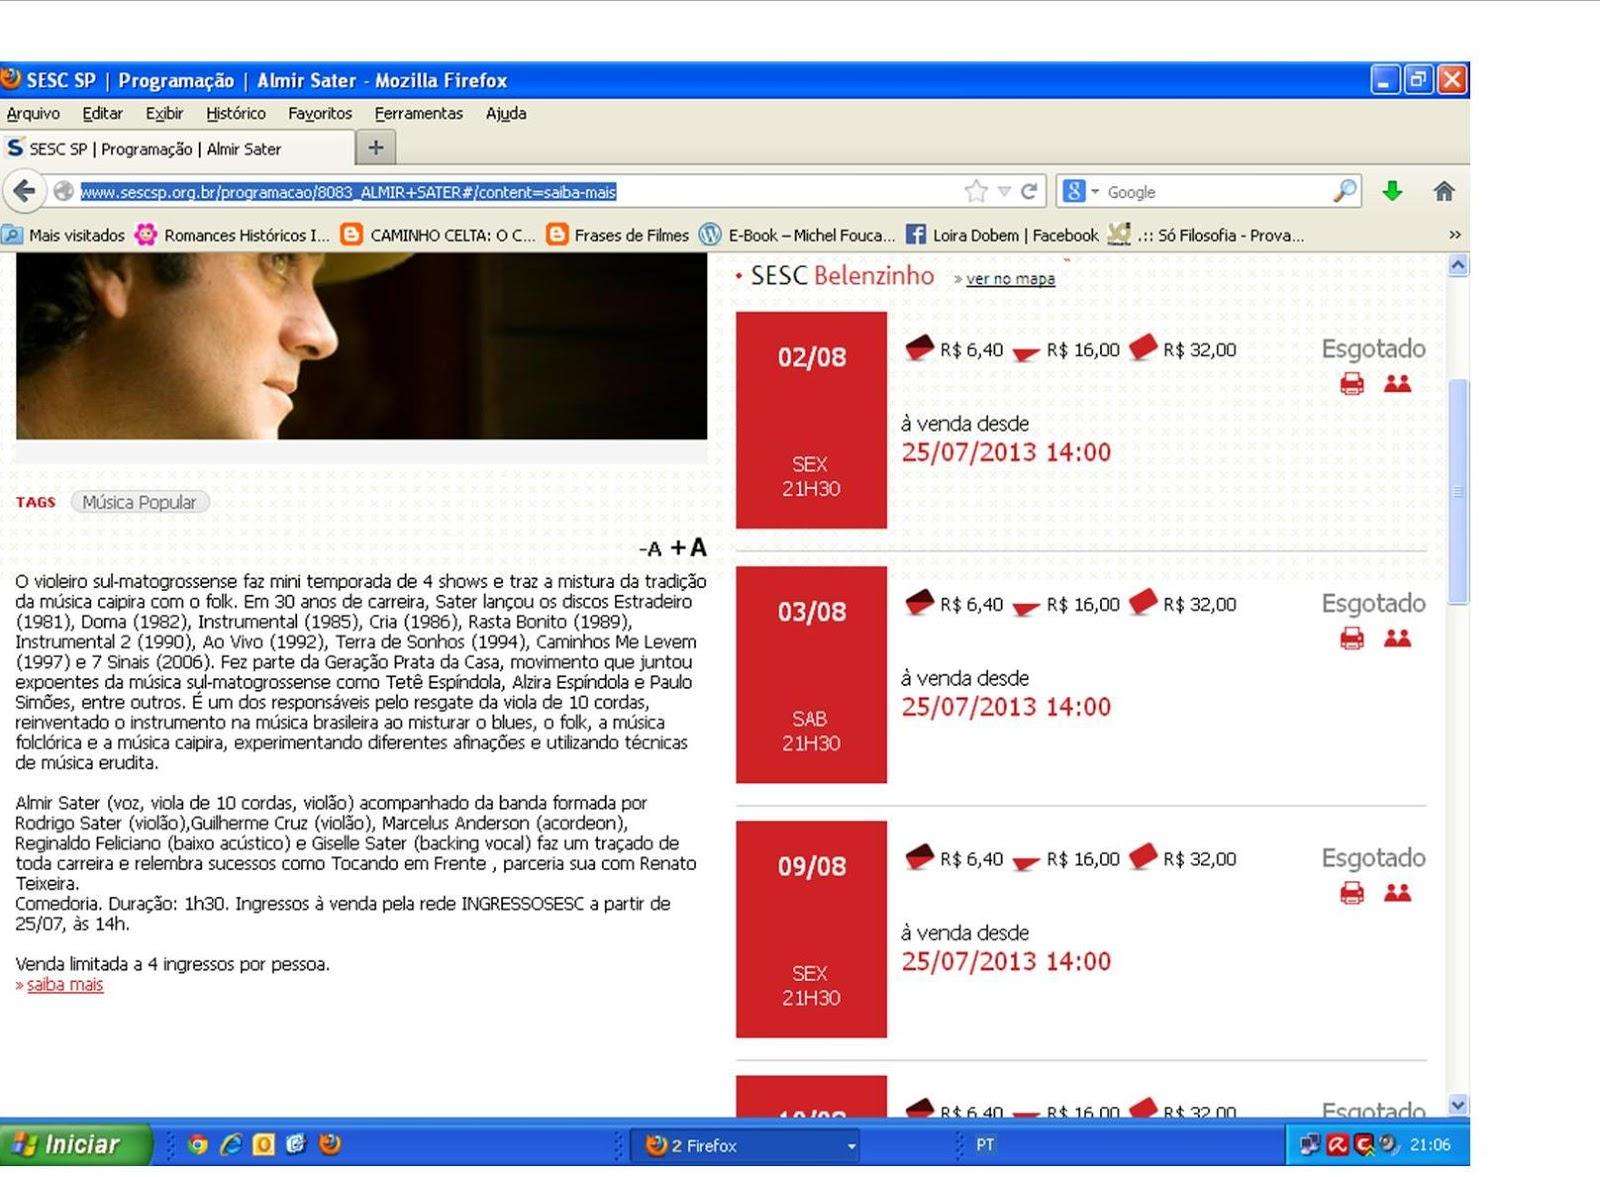 Blog loira dobem entretenimento cultural - Javascript clear div content ...